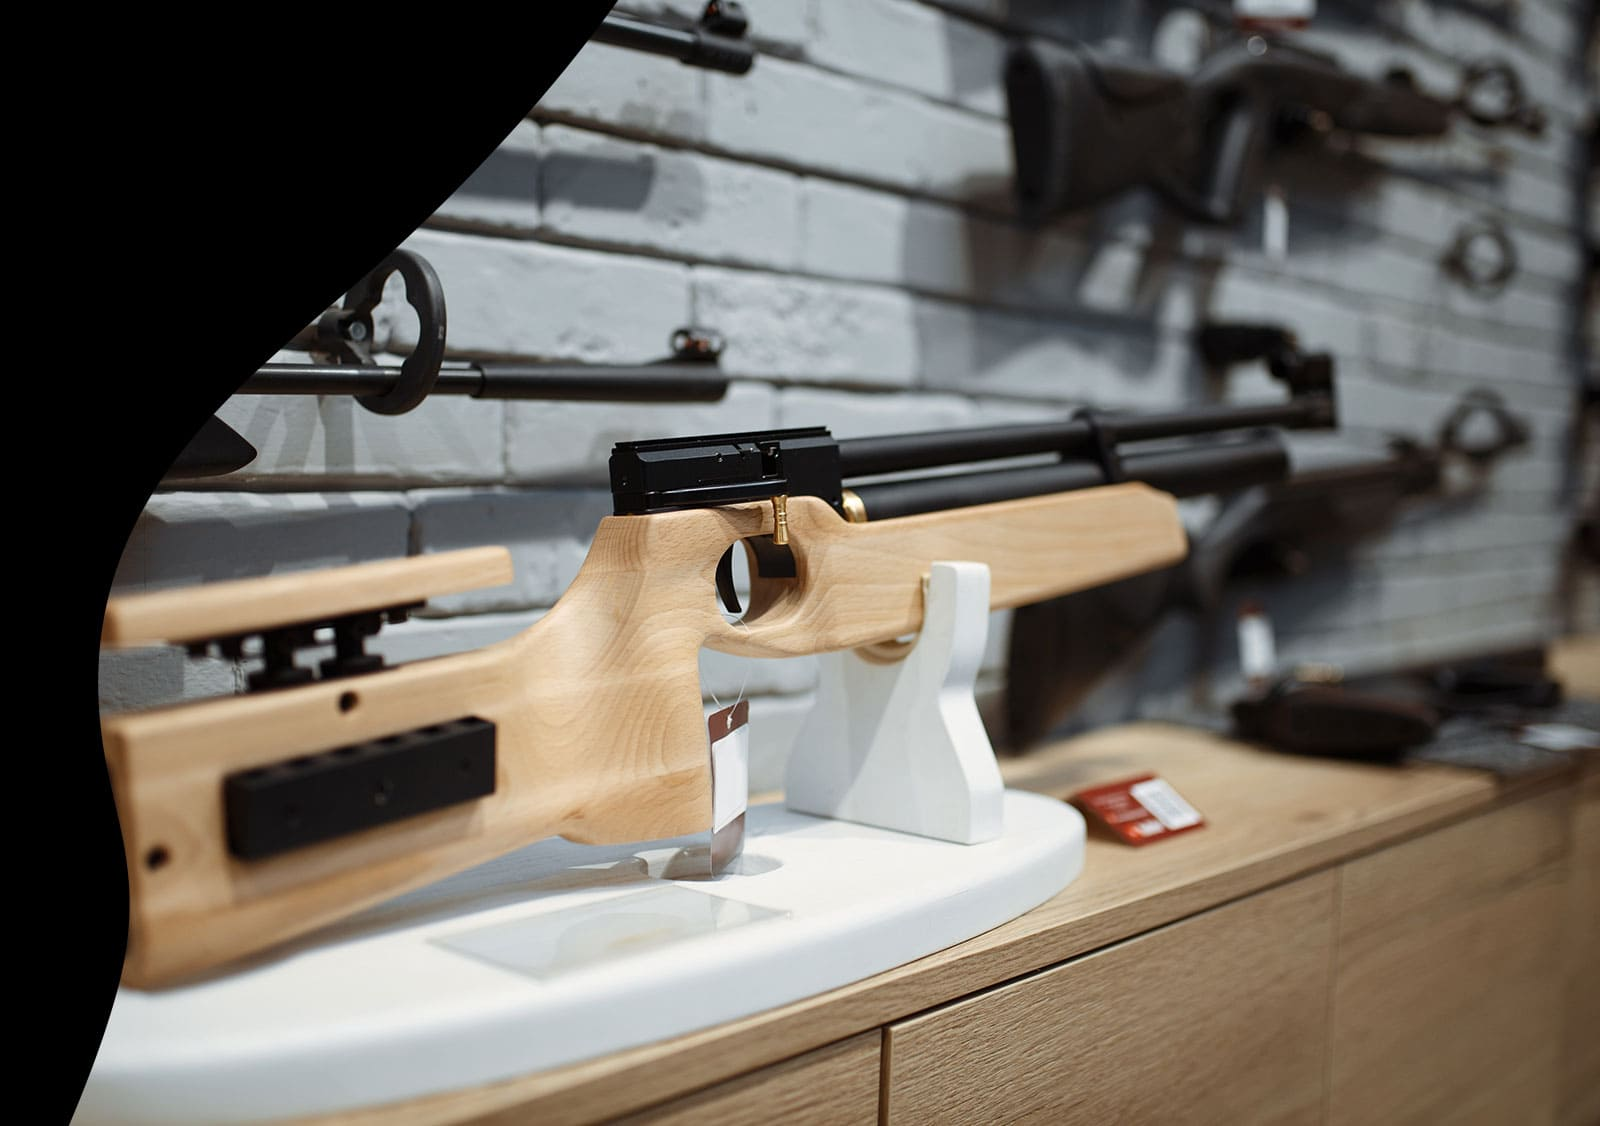 gun-store-pos-system